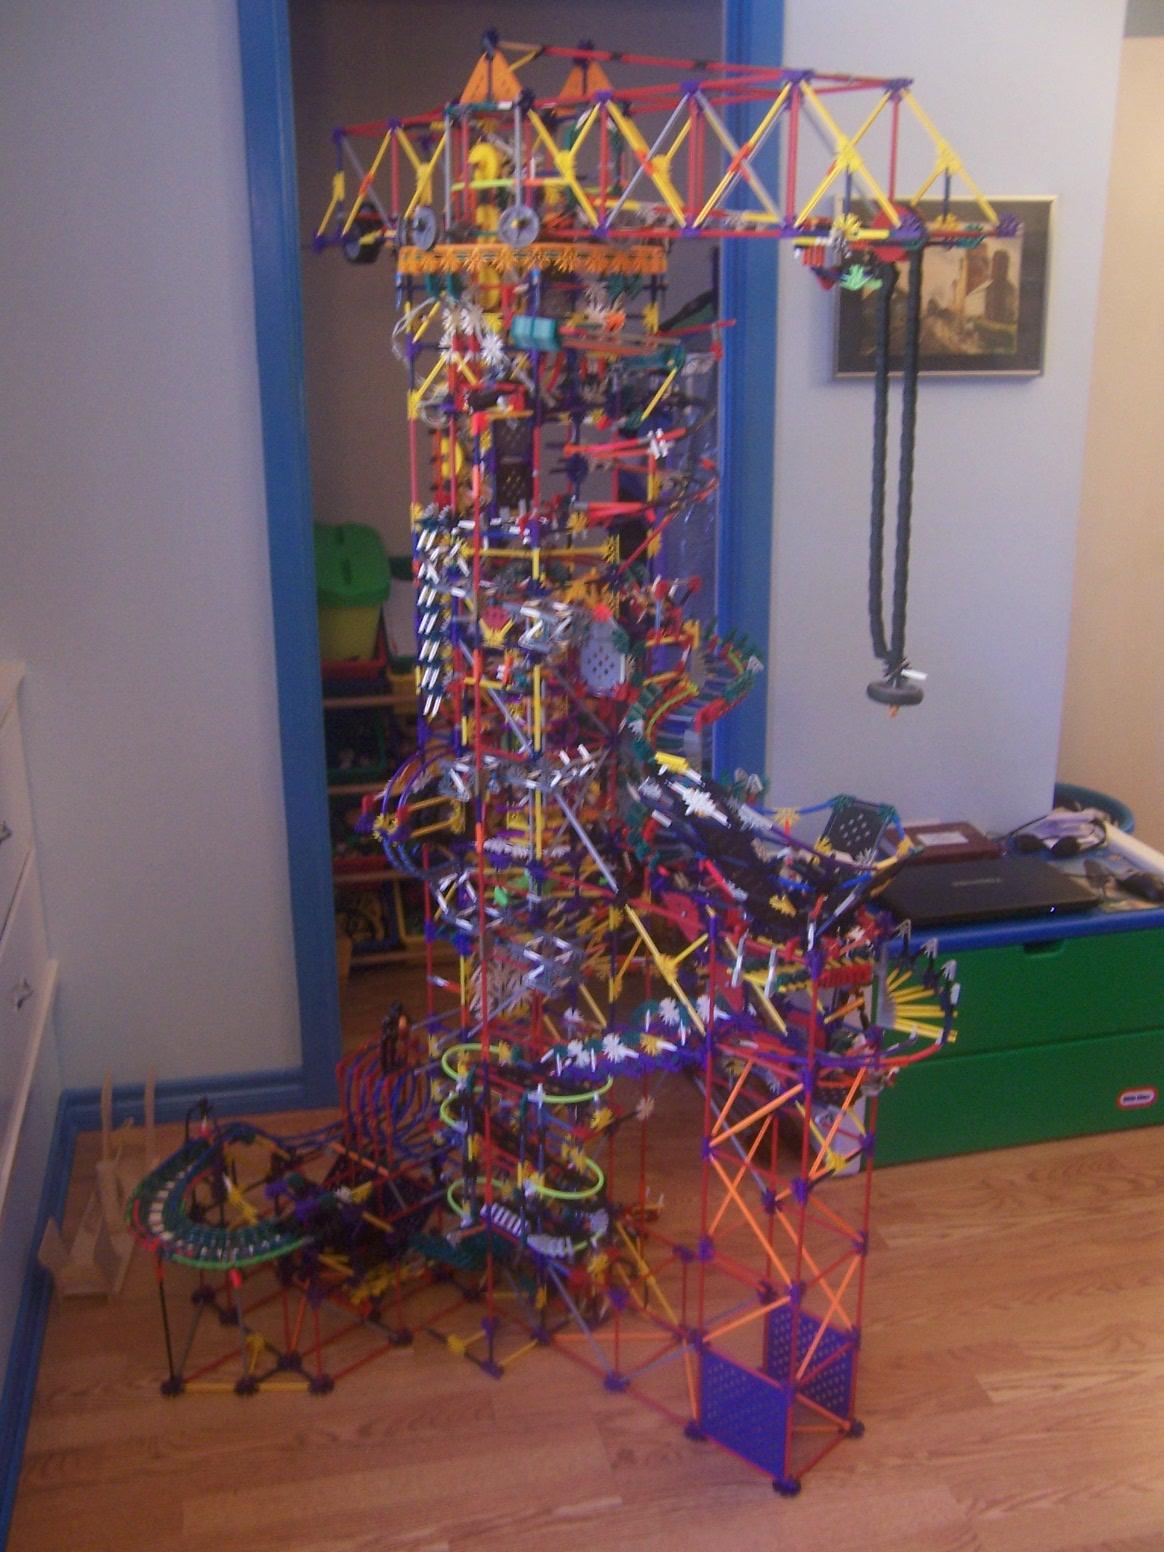 Picture of Erection - a K'nex Ball Machine